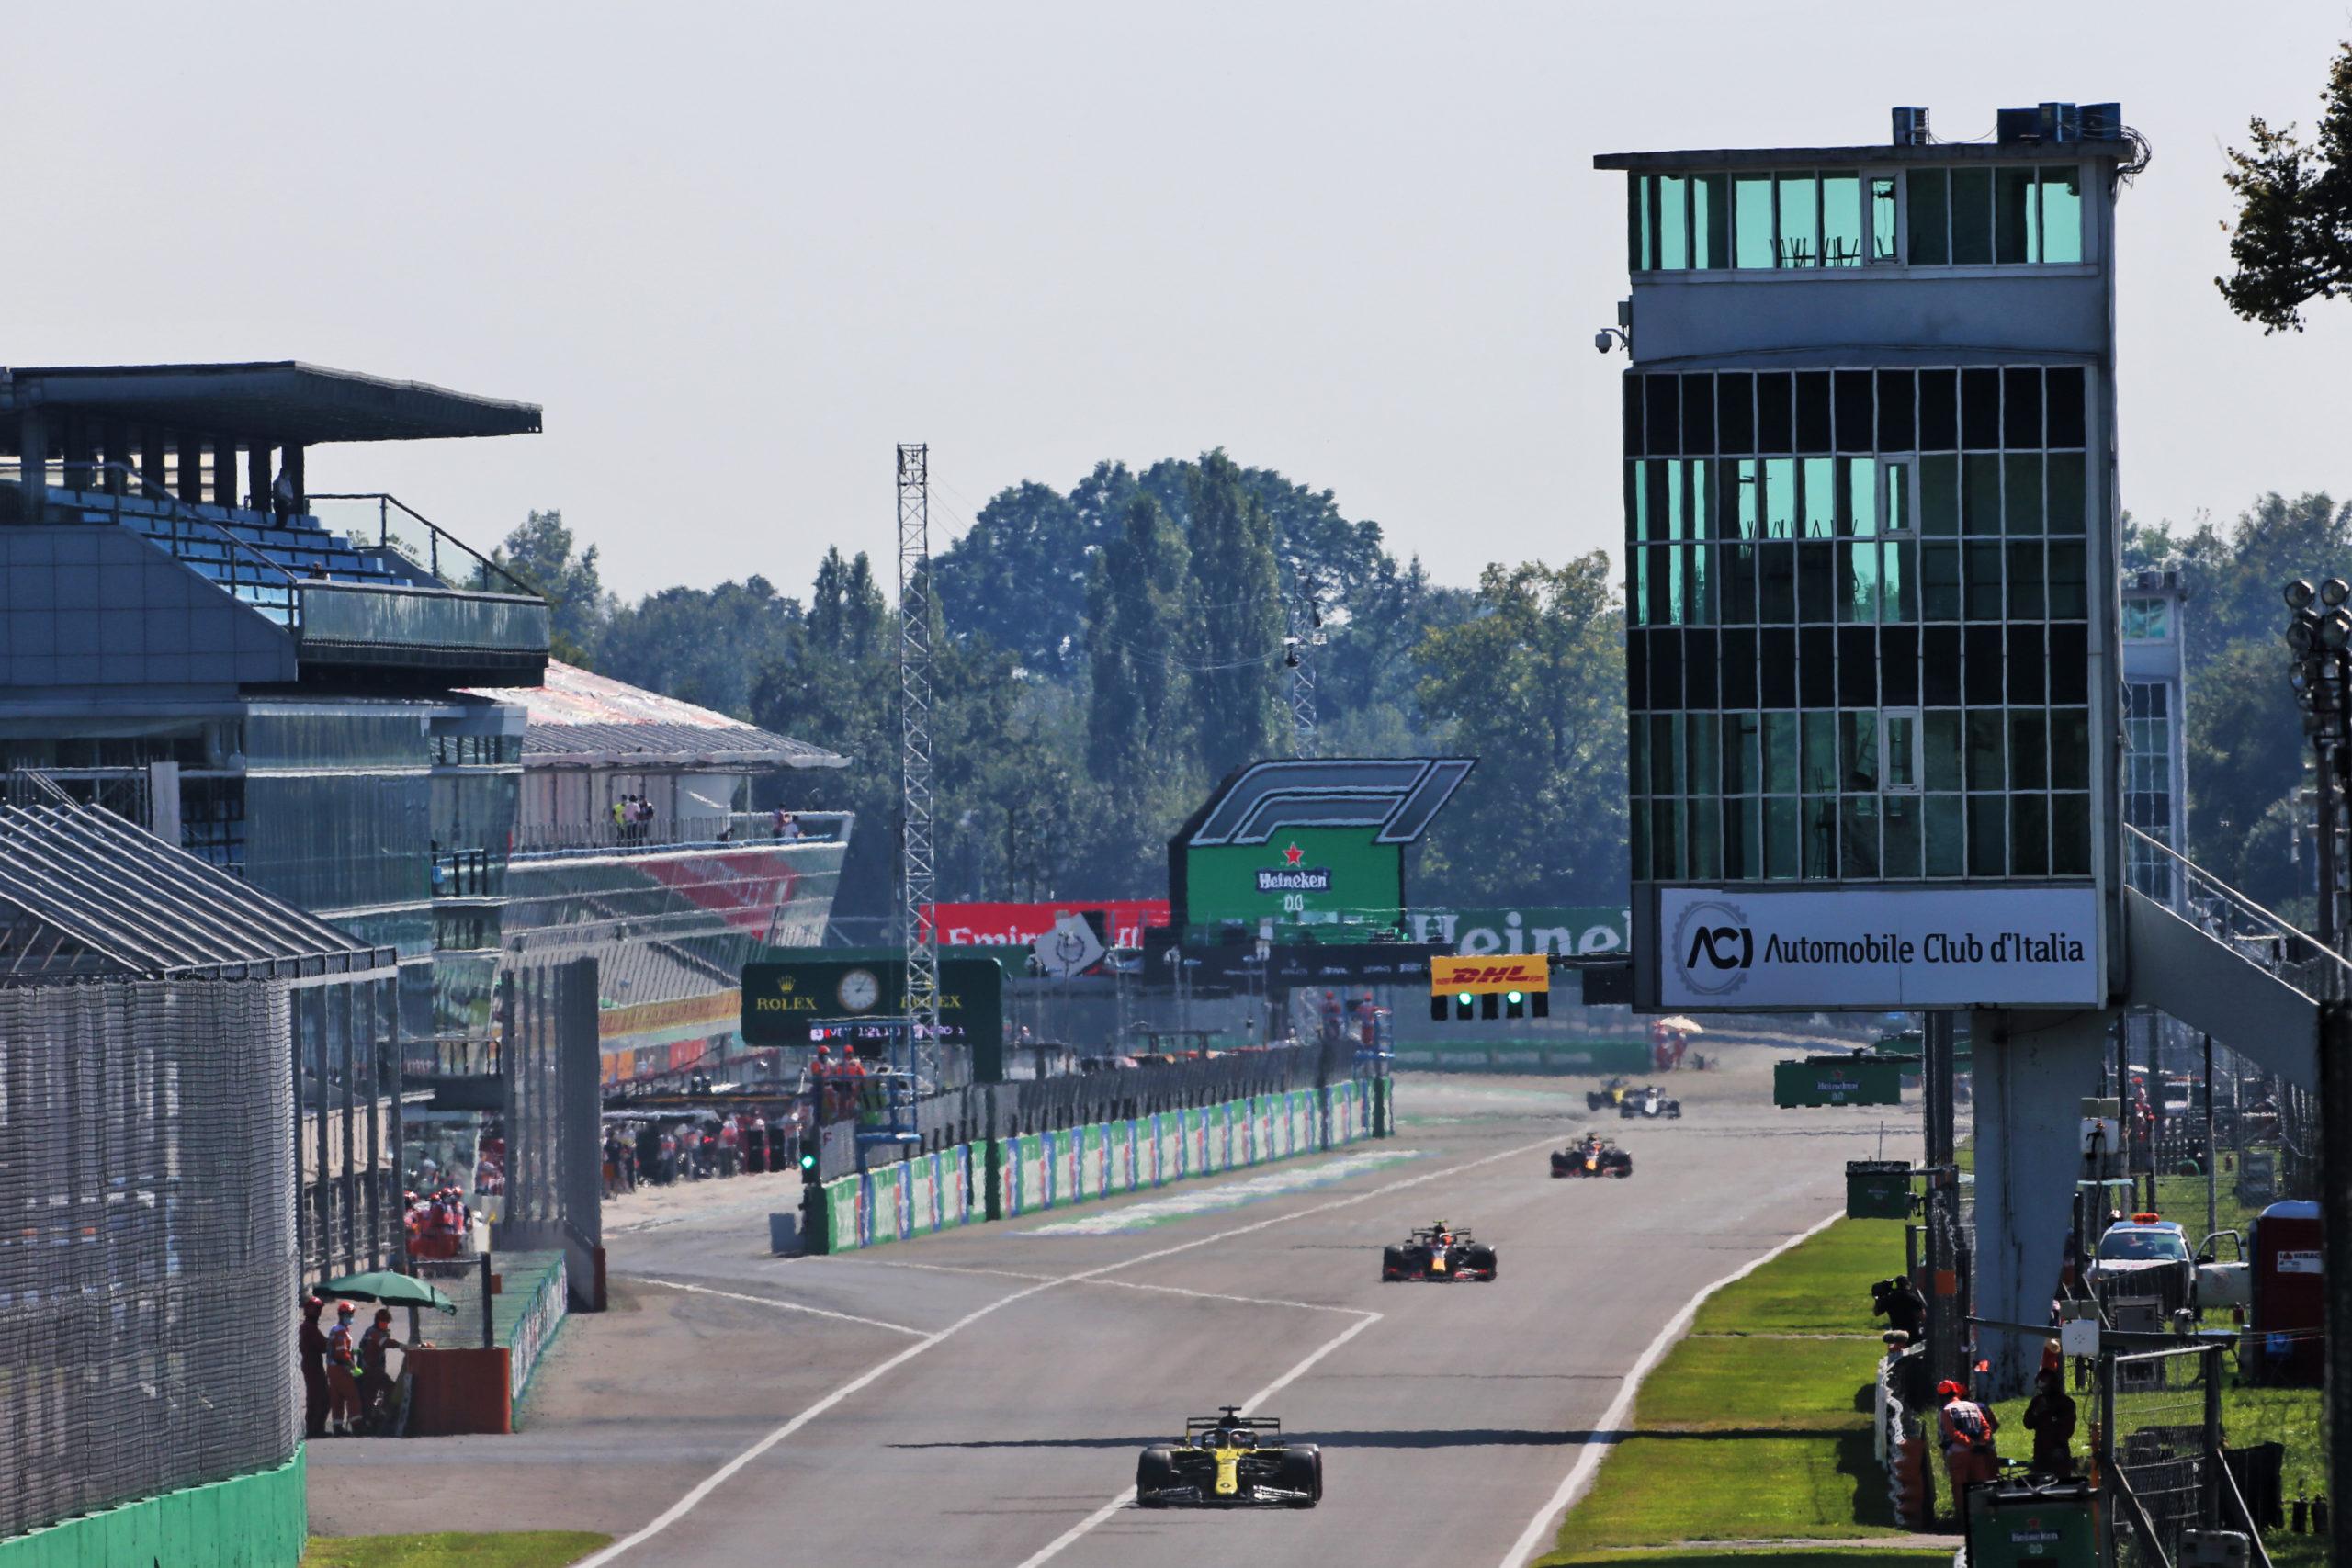 Daniel Ricciardo (AUS) Renault F1 Team RS20. Italian Grand Prix, Saturday 5th September 2020. Monza Italy.